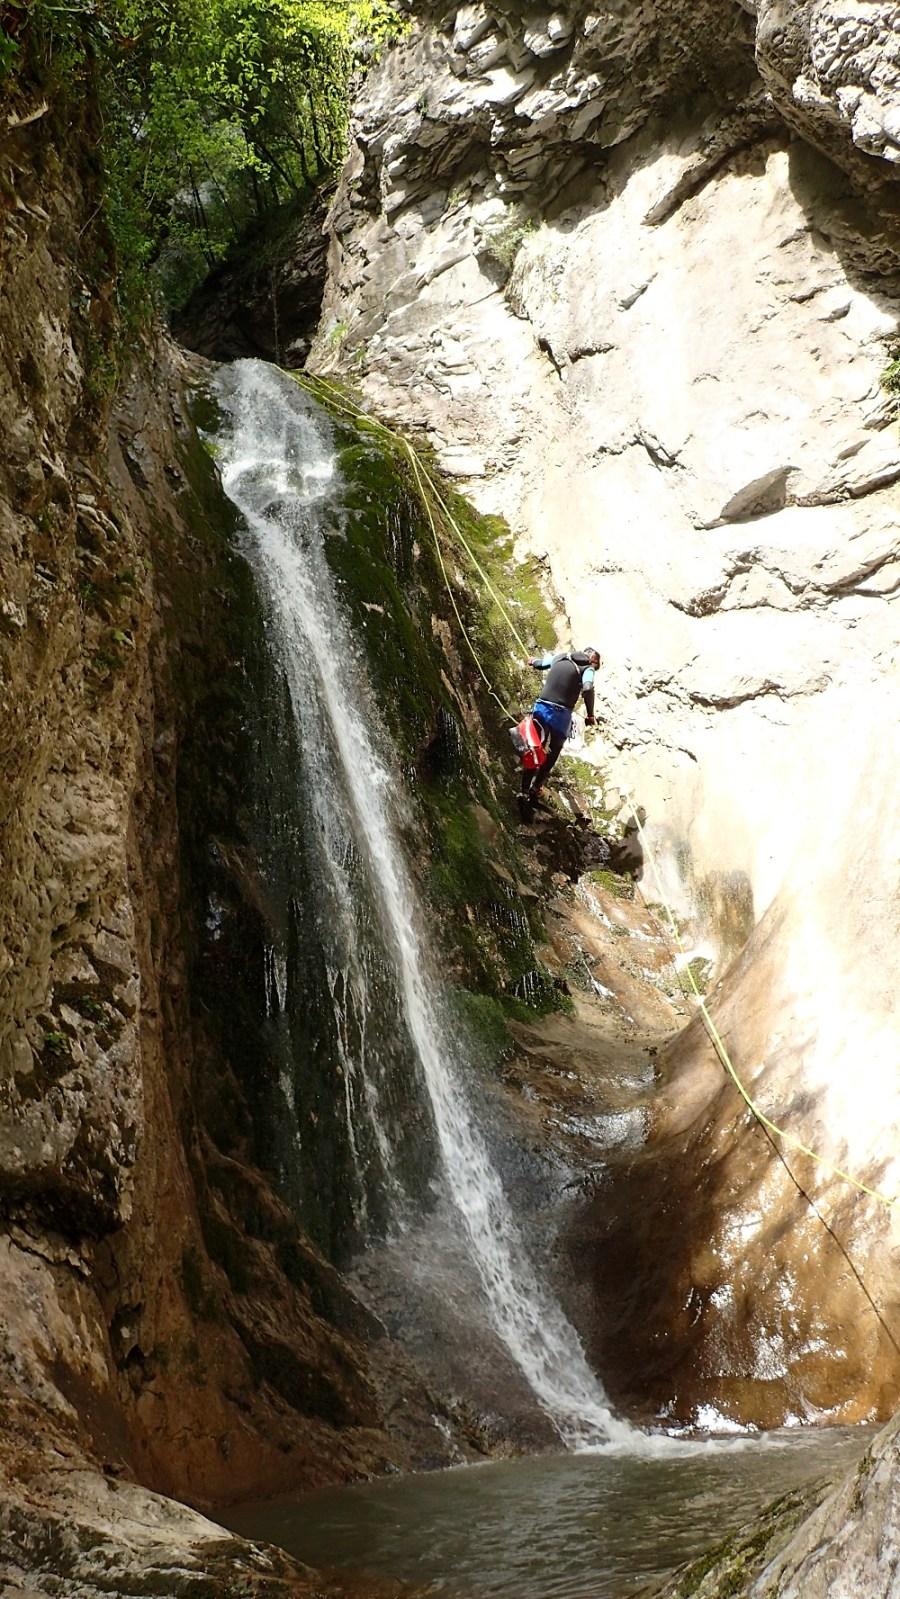 Canyon Errekaltia - Ur eta Lur, Canyoning et Randonnée